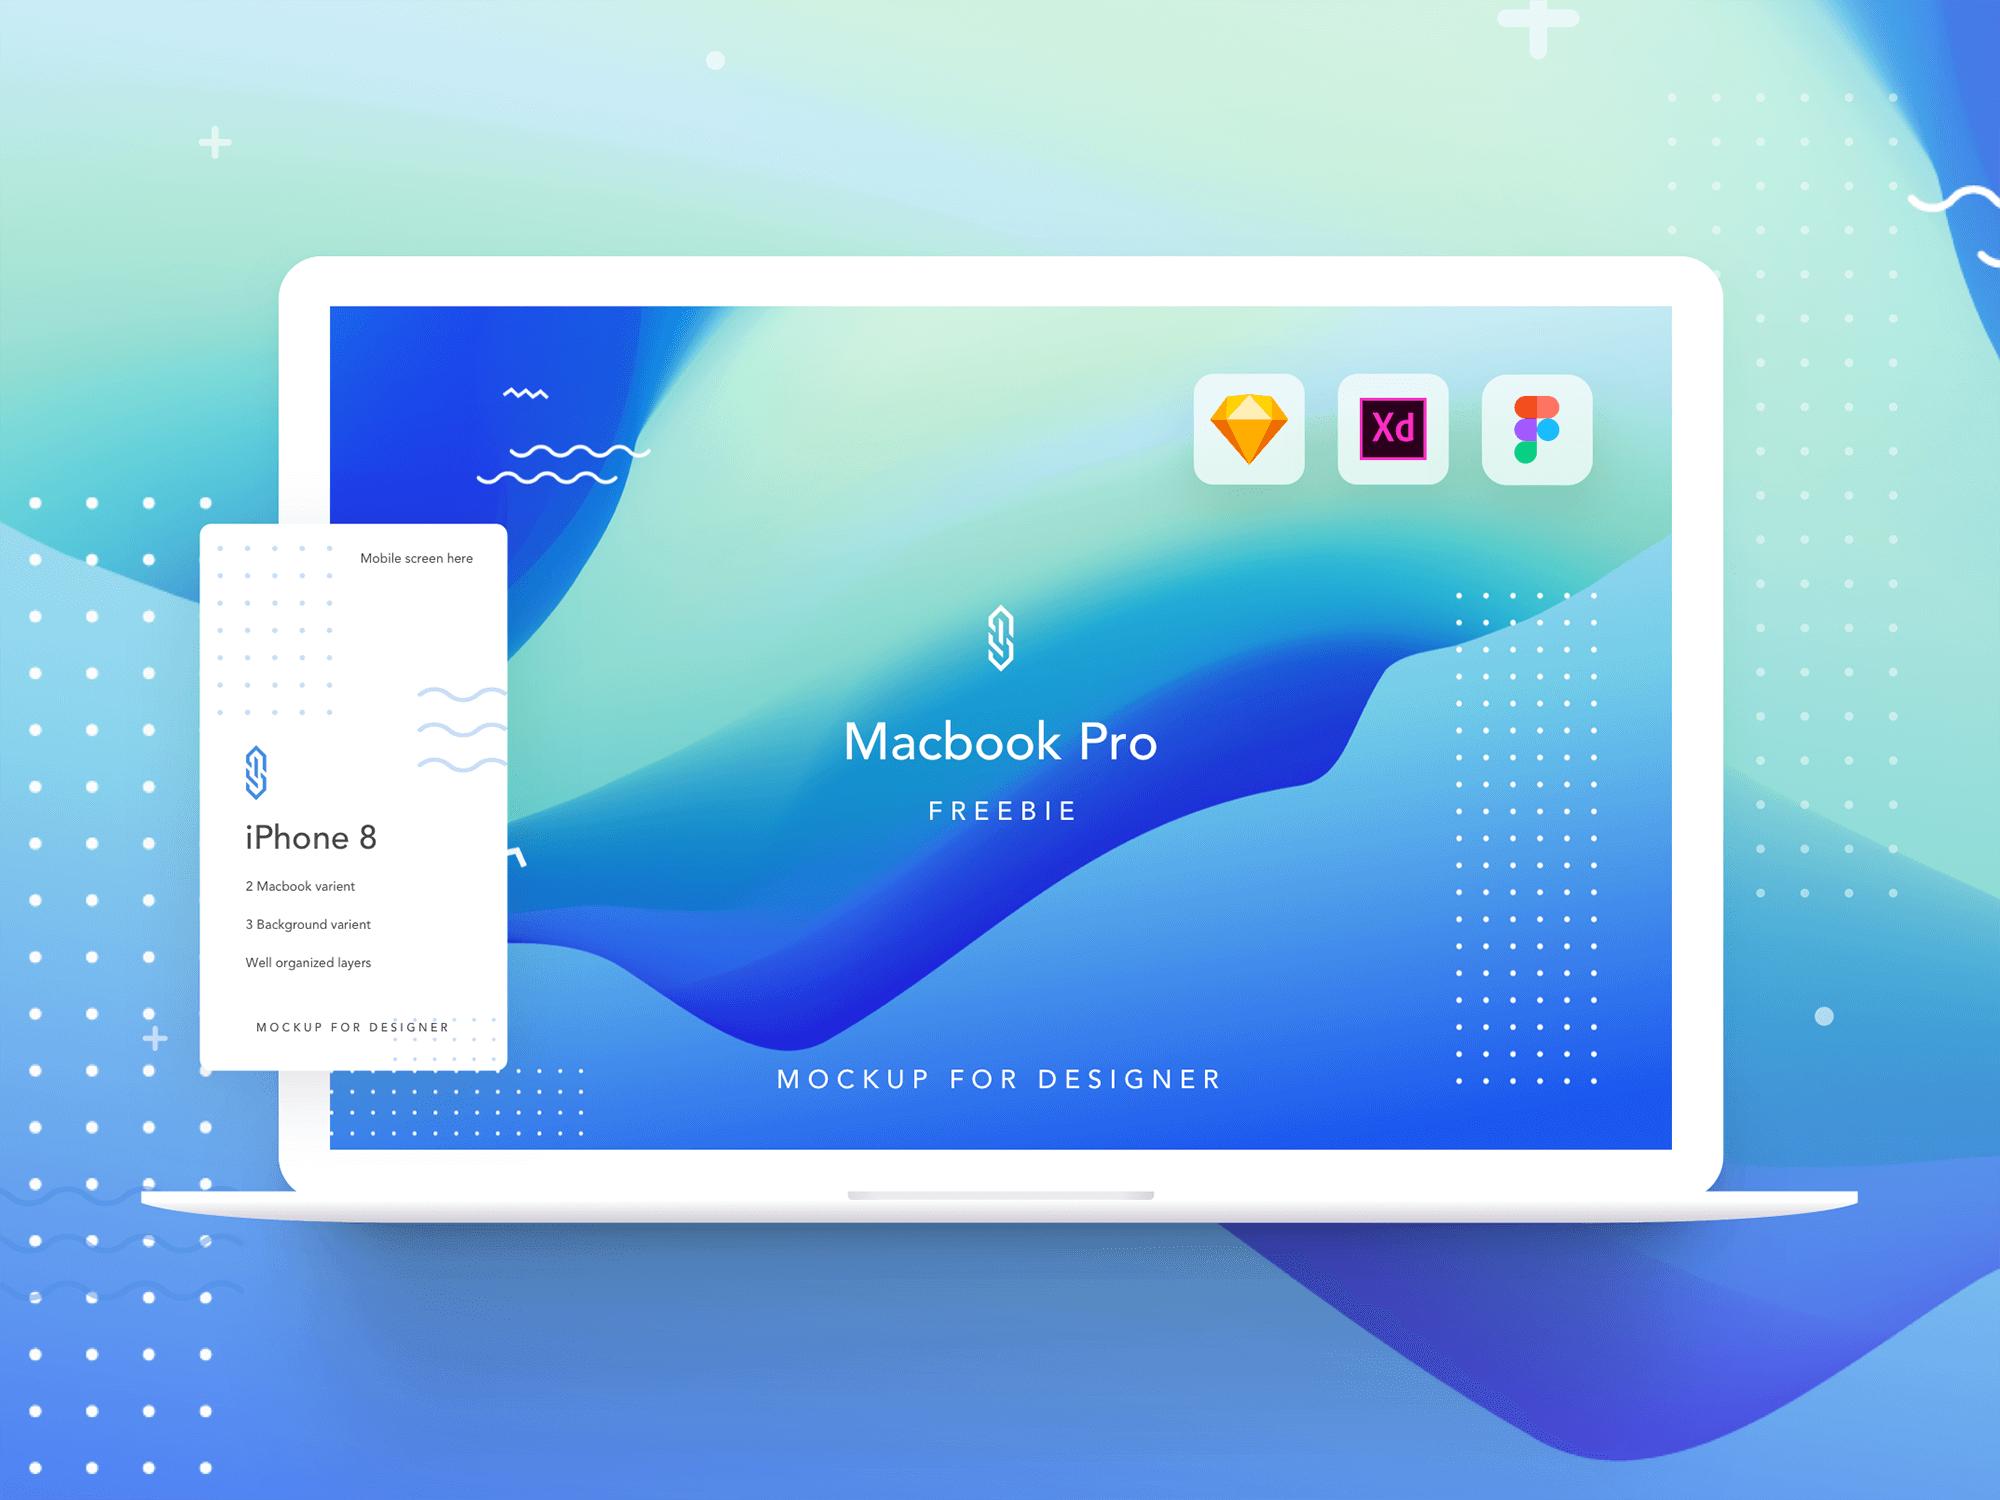 Mackbook Pro mockup presentation image